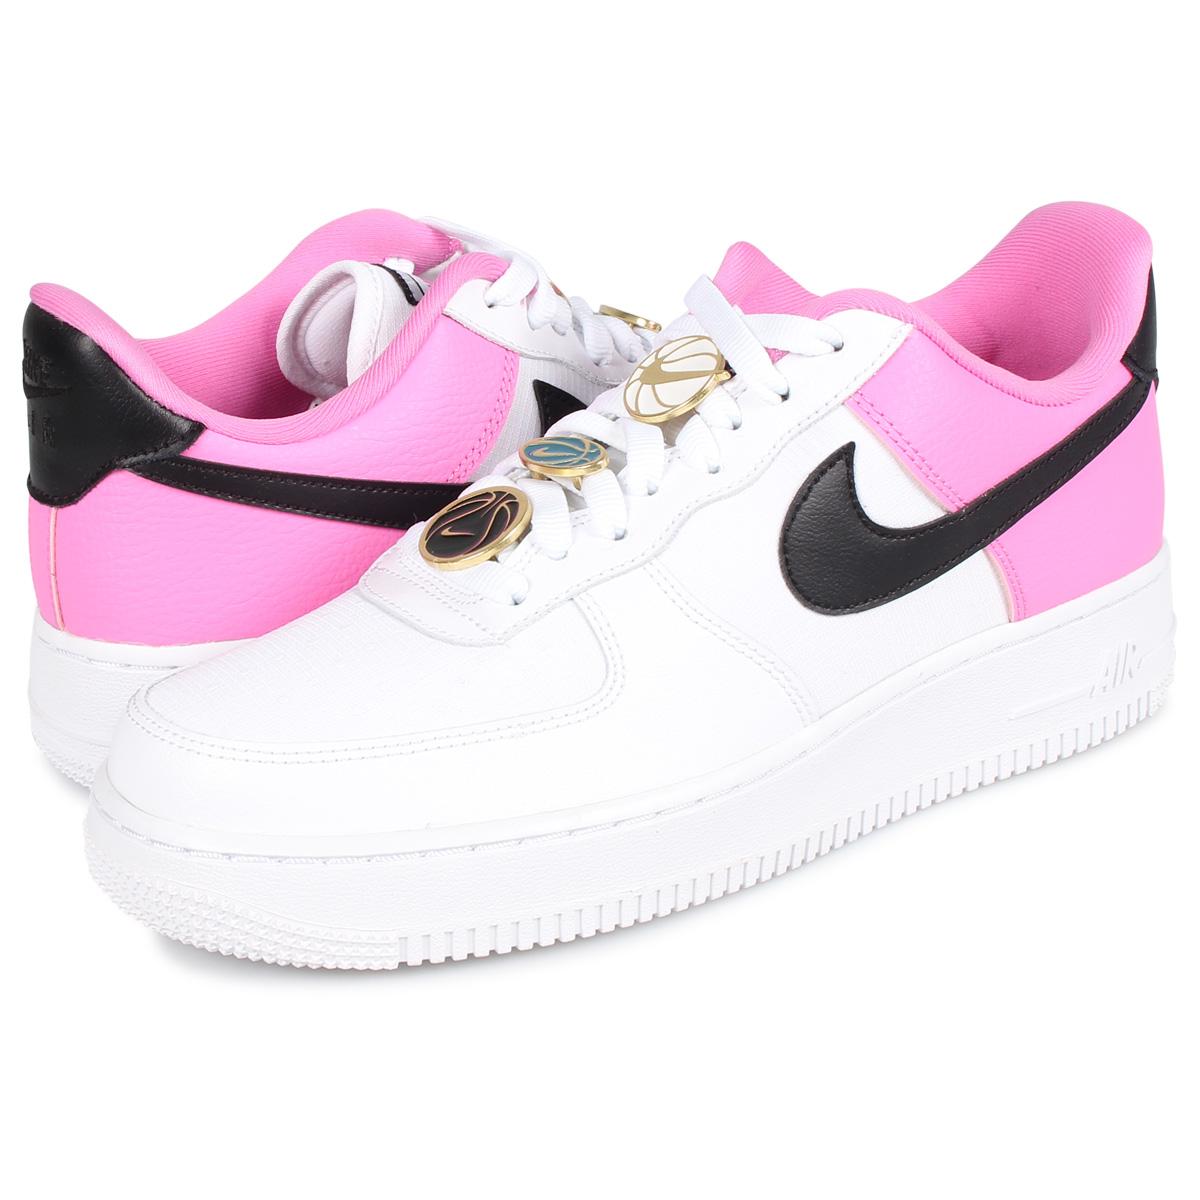 NIKE WMNS AIR FORCE 1 LOW SE Nike air force 1 sneakers men gap Dis white white AA0287 107